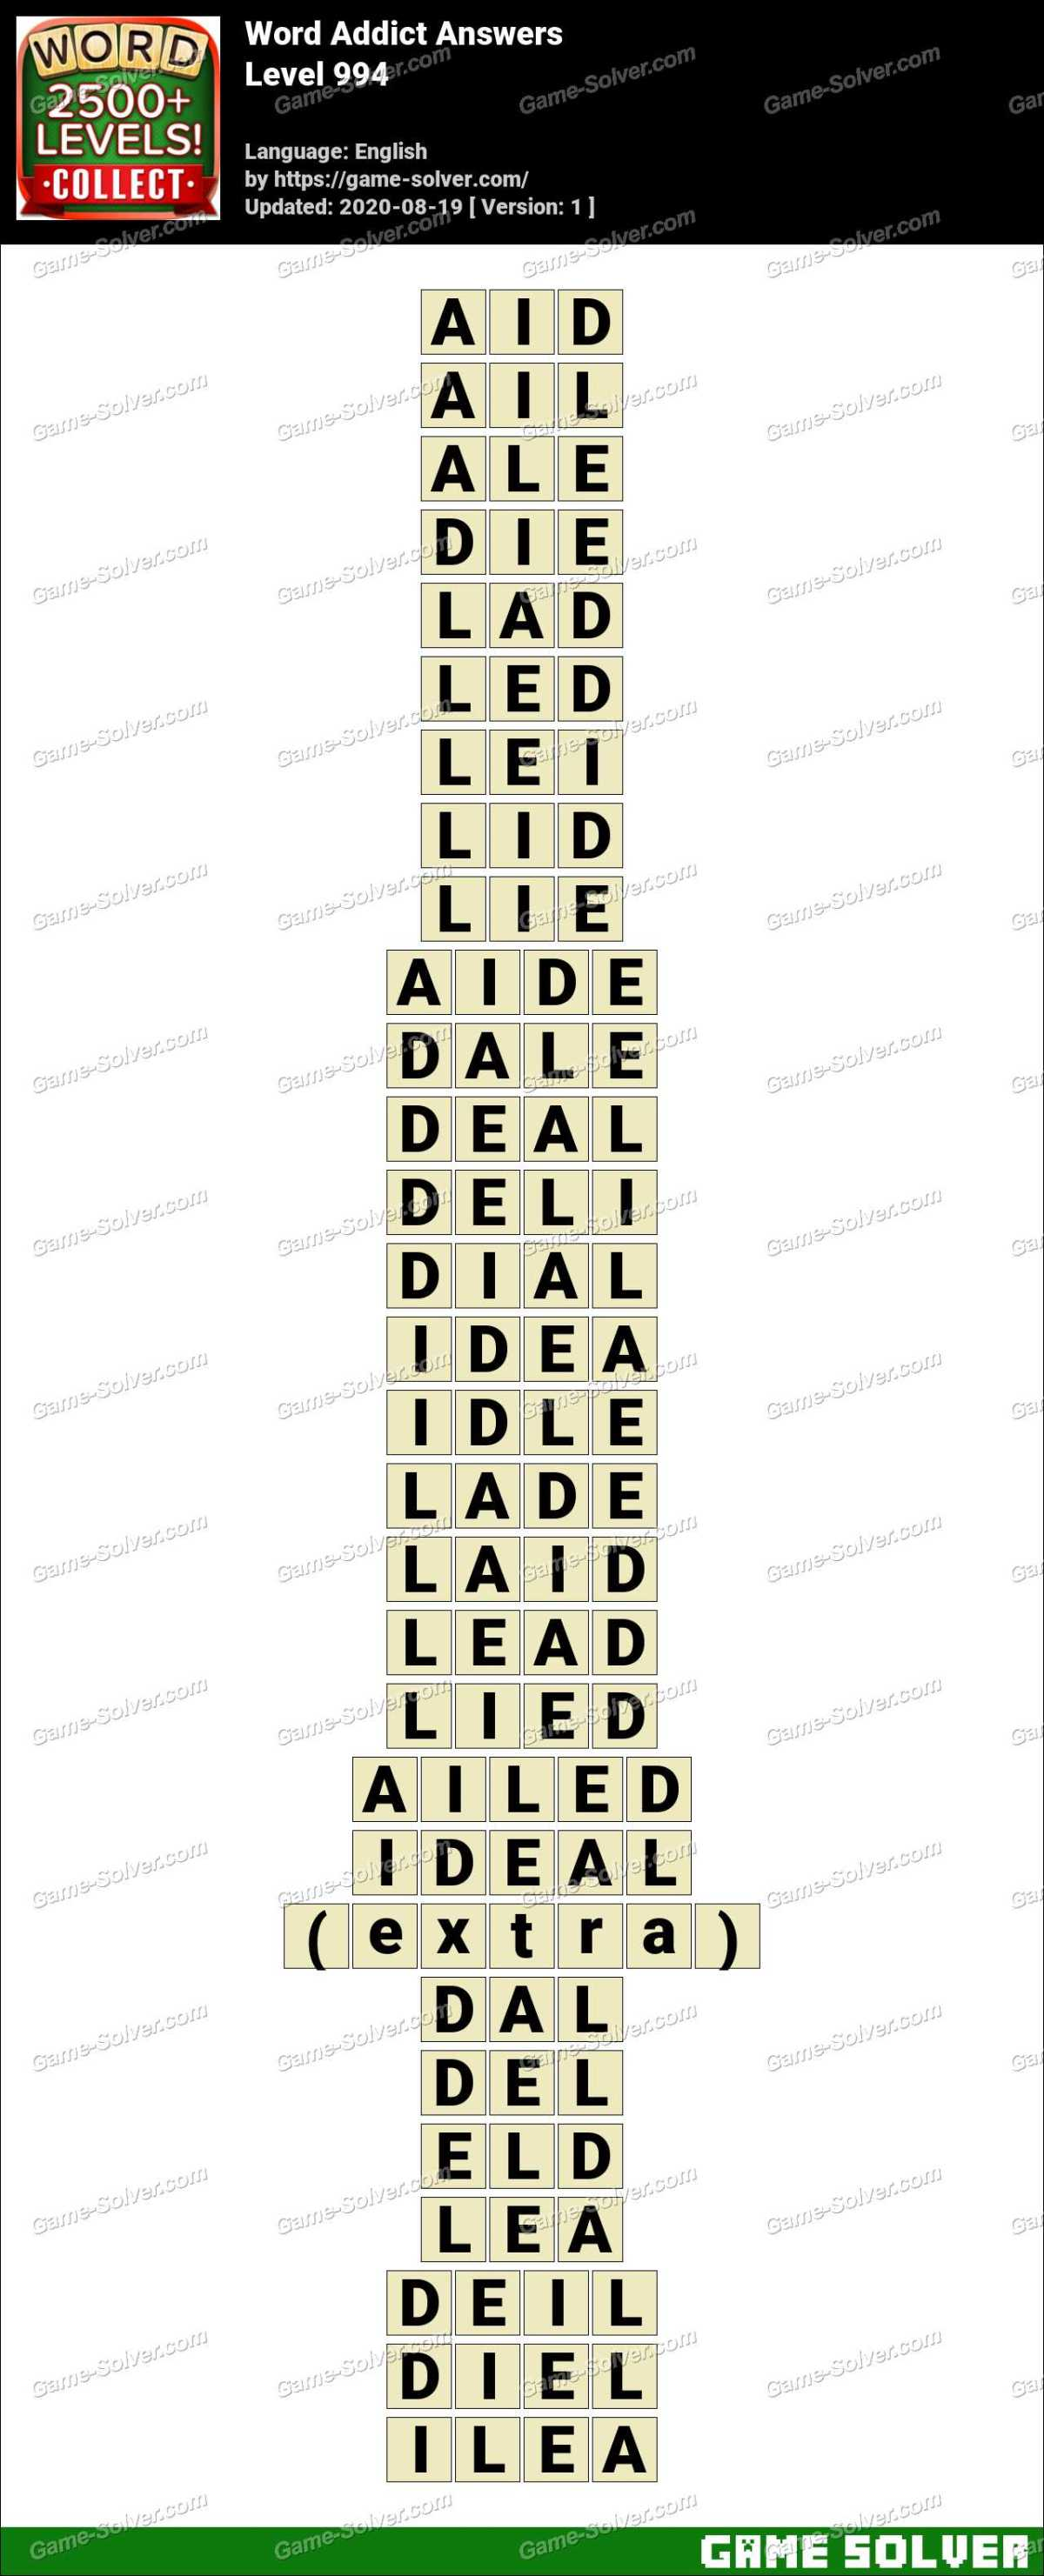 Word Addict Level 994 Answers